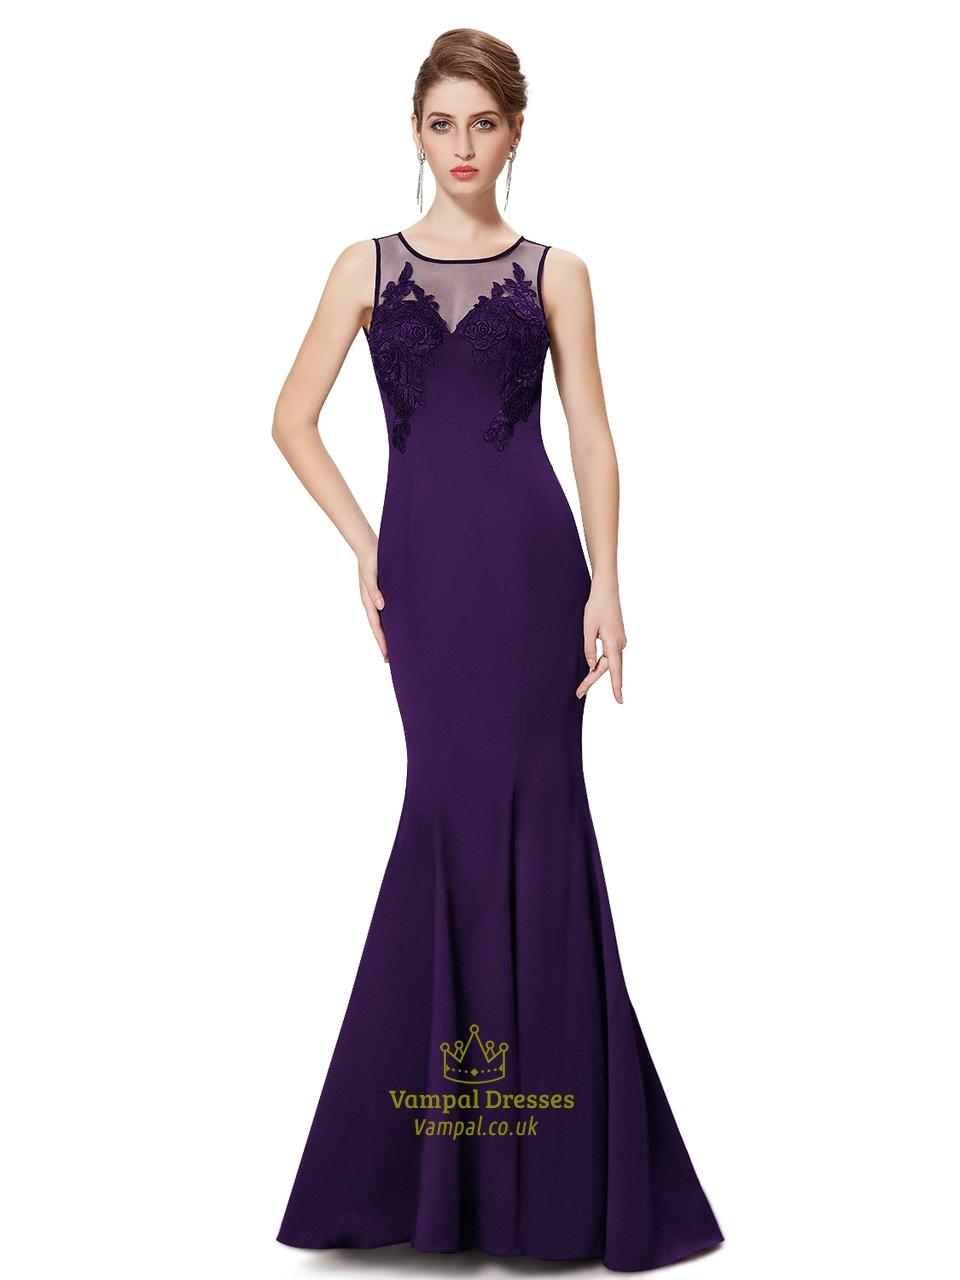 Purple Mermaid Illusion Neckline Prom Dresses With Floral